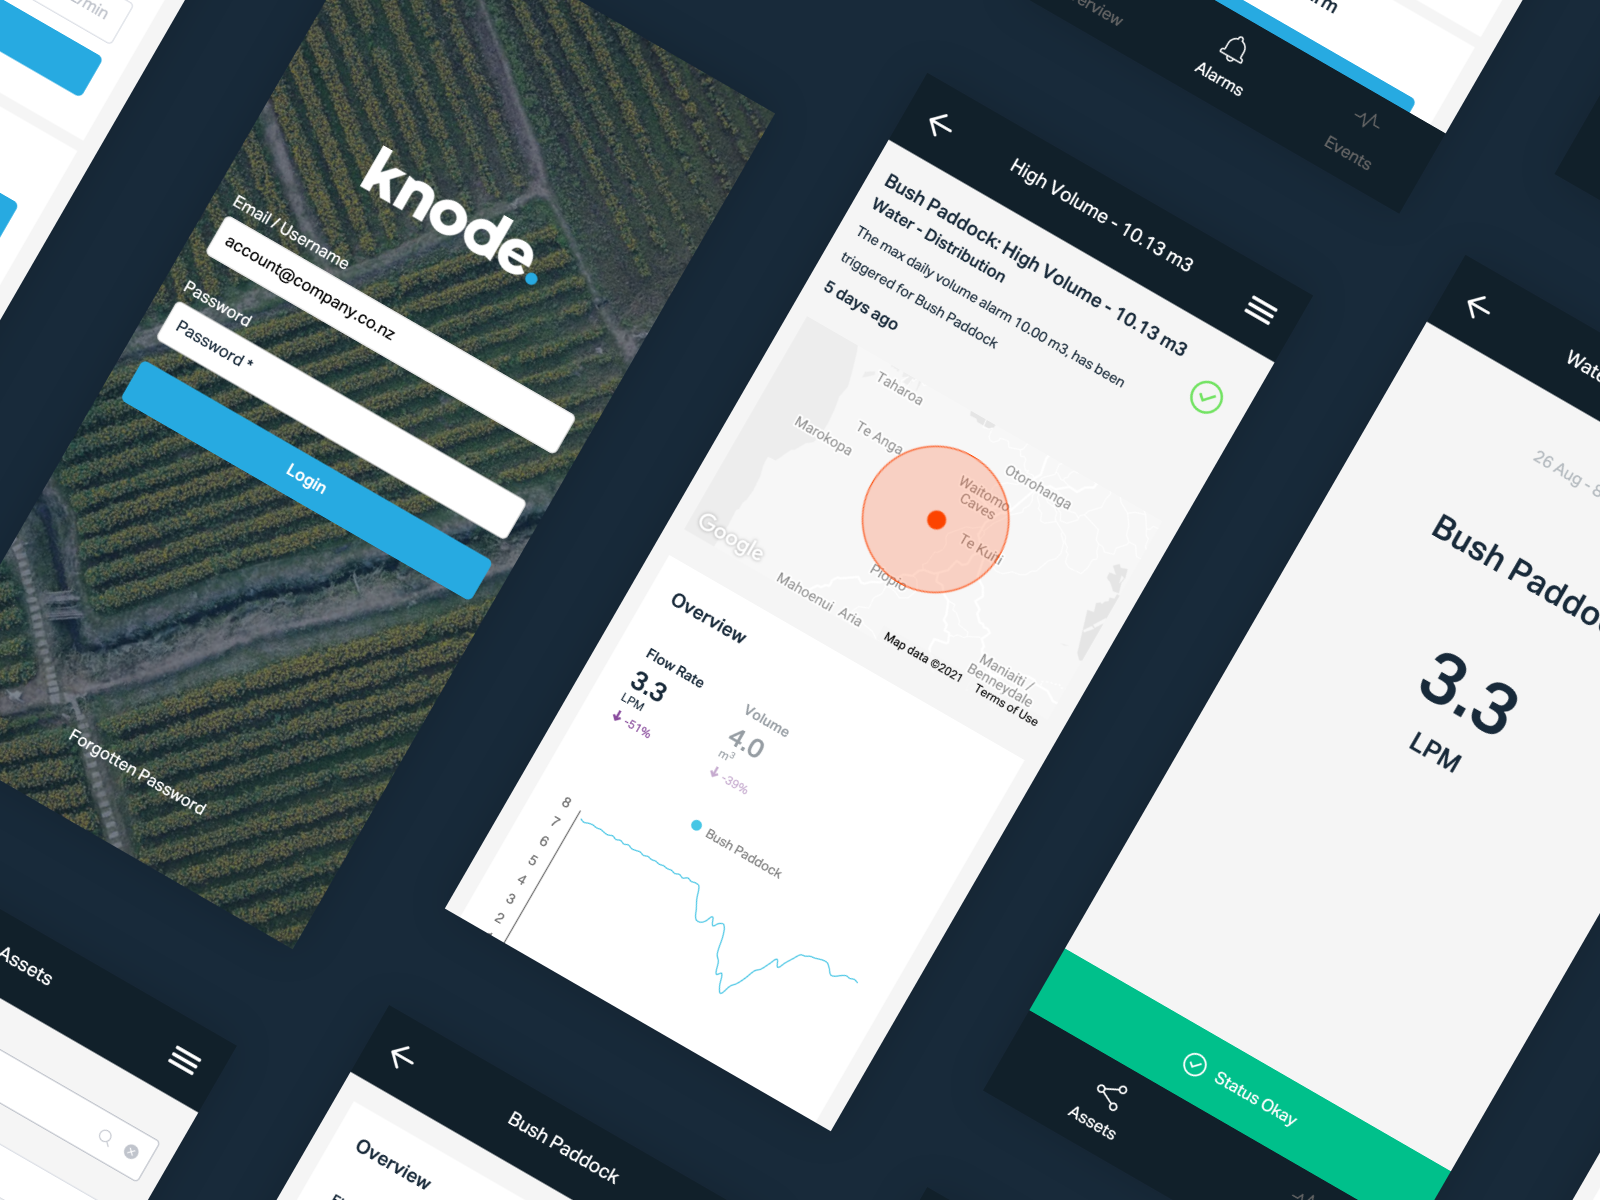 Knode - IoT Analytics & Reporting Platform